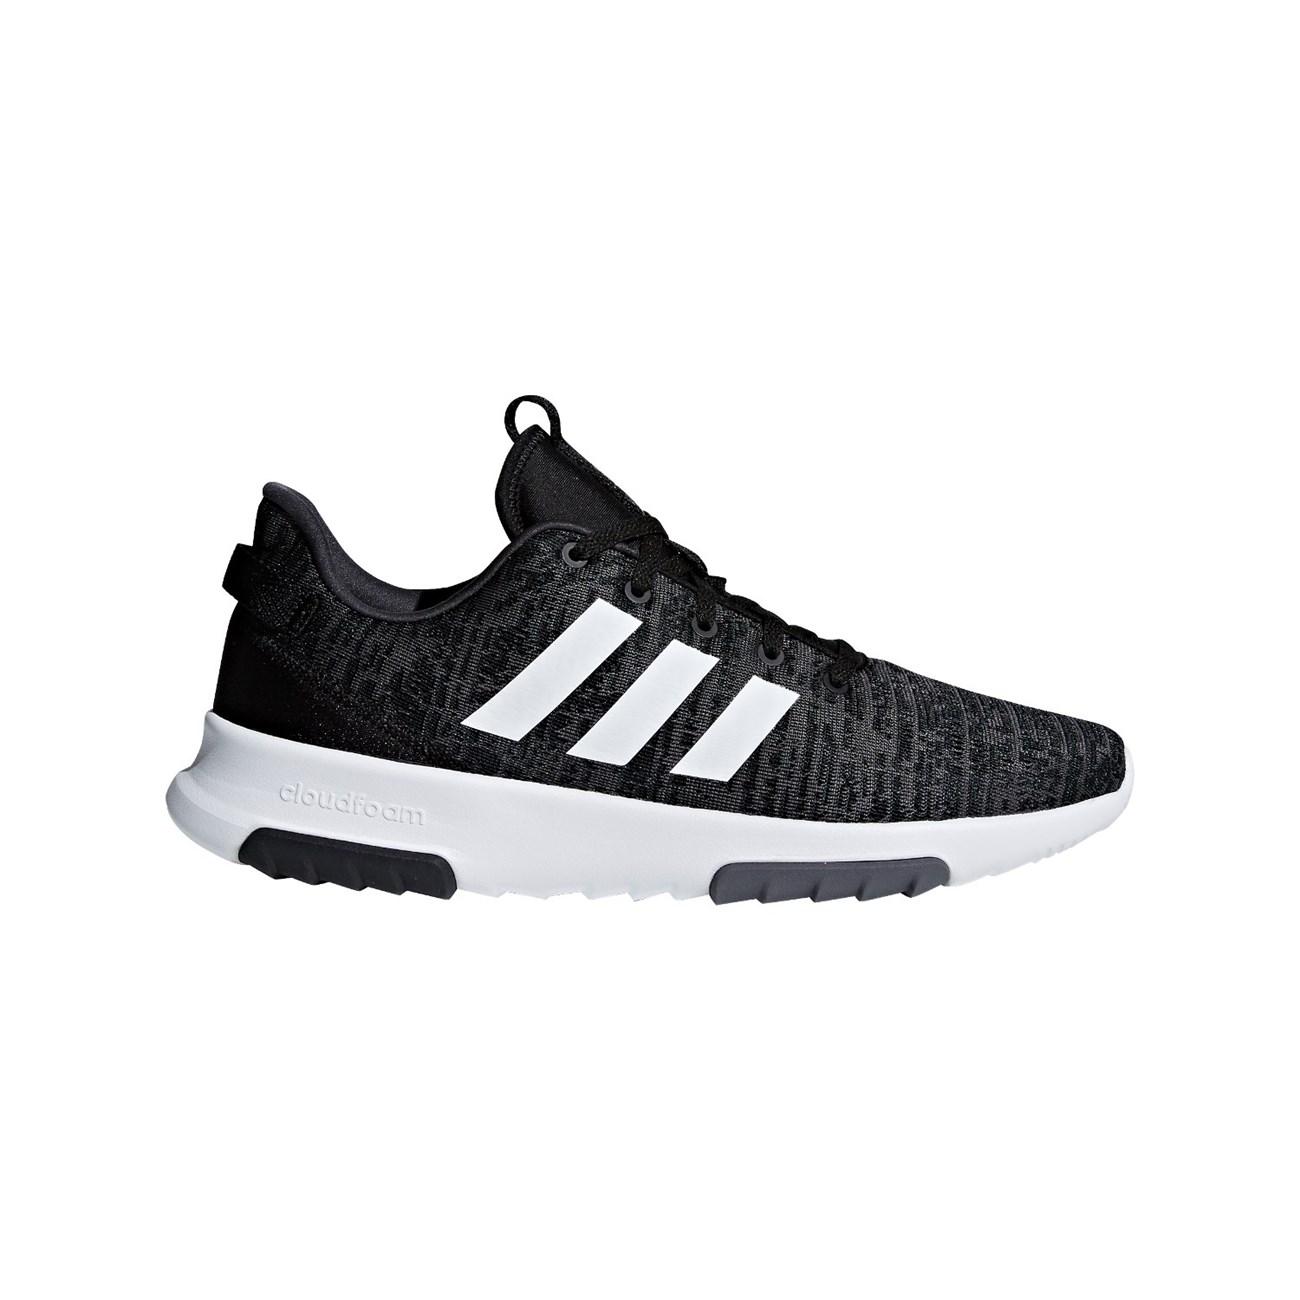 ADIDAS CLOUDFOAM RACER TR   Sportstyle Παπούτσια  1781a7b420d